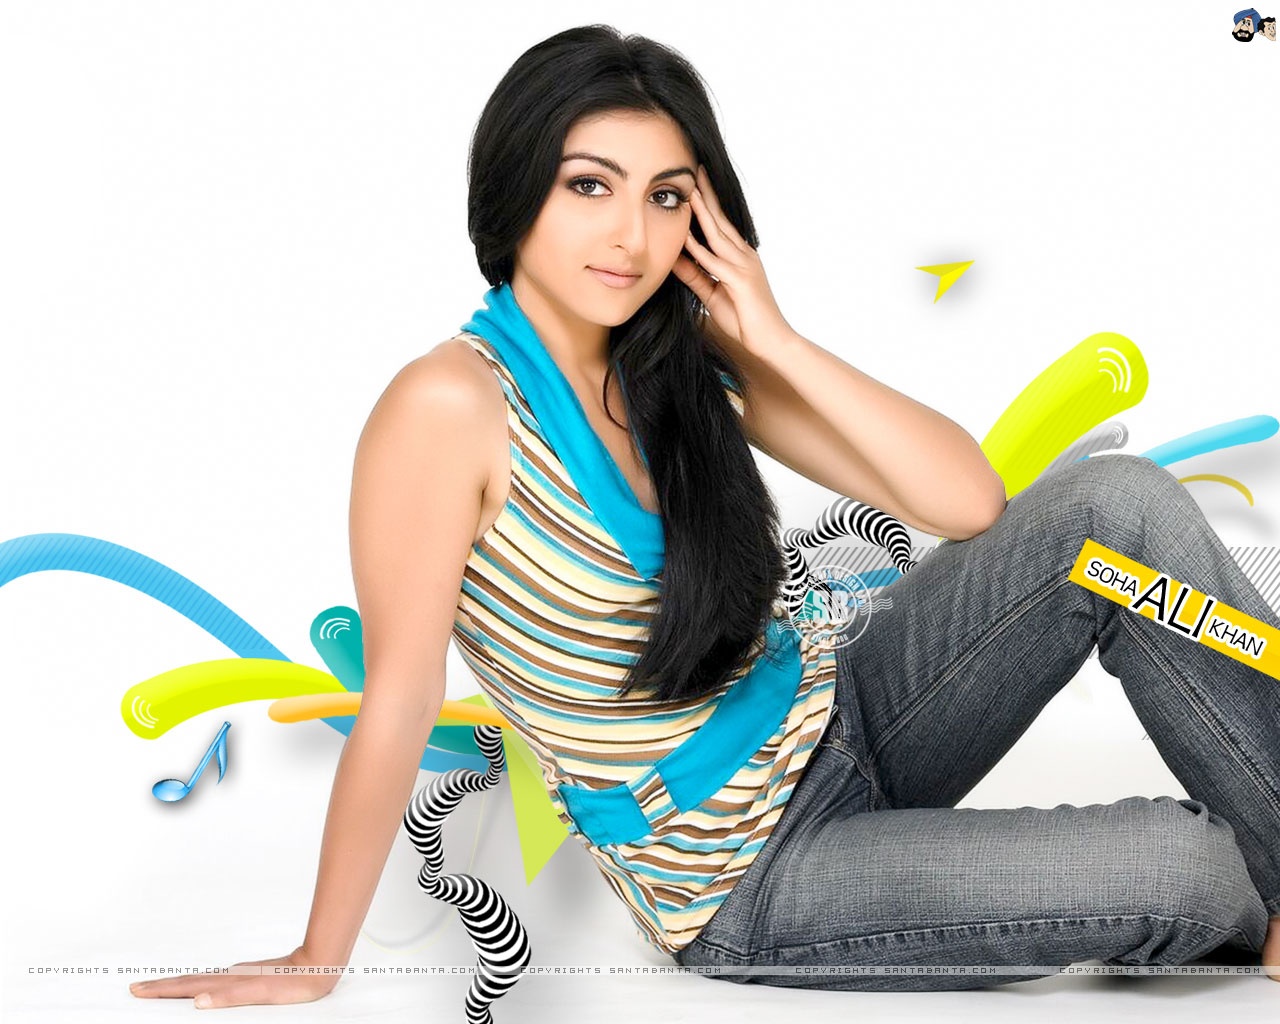 Soha Ali Khan HD Wallpaper